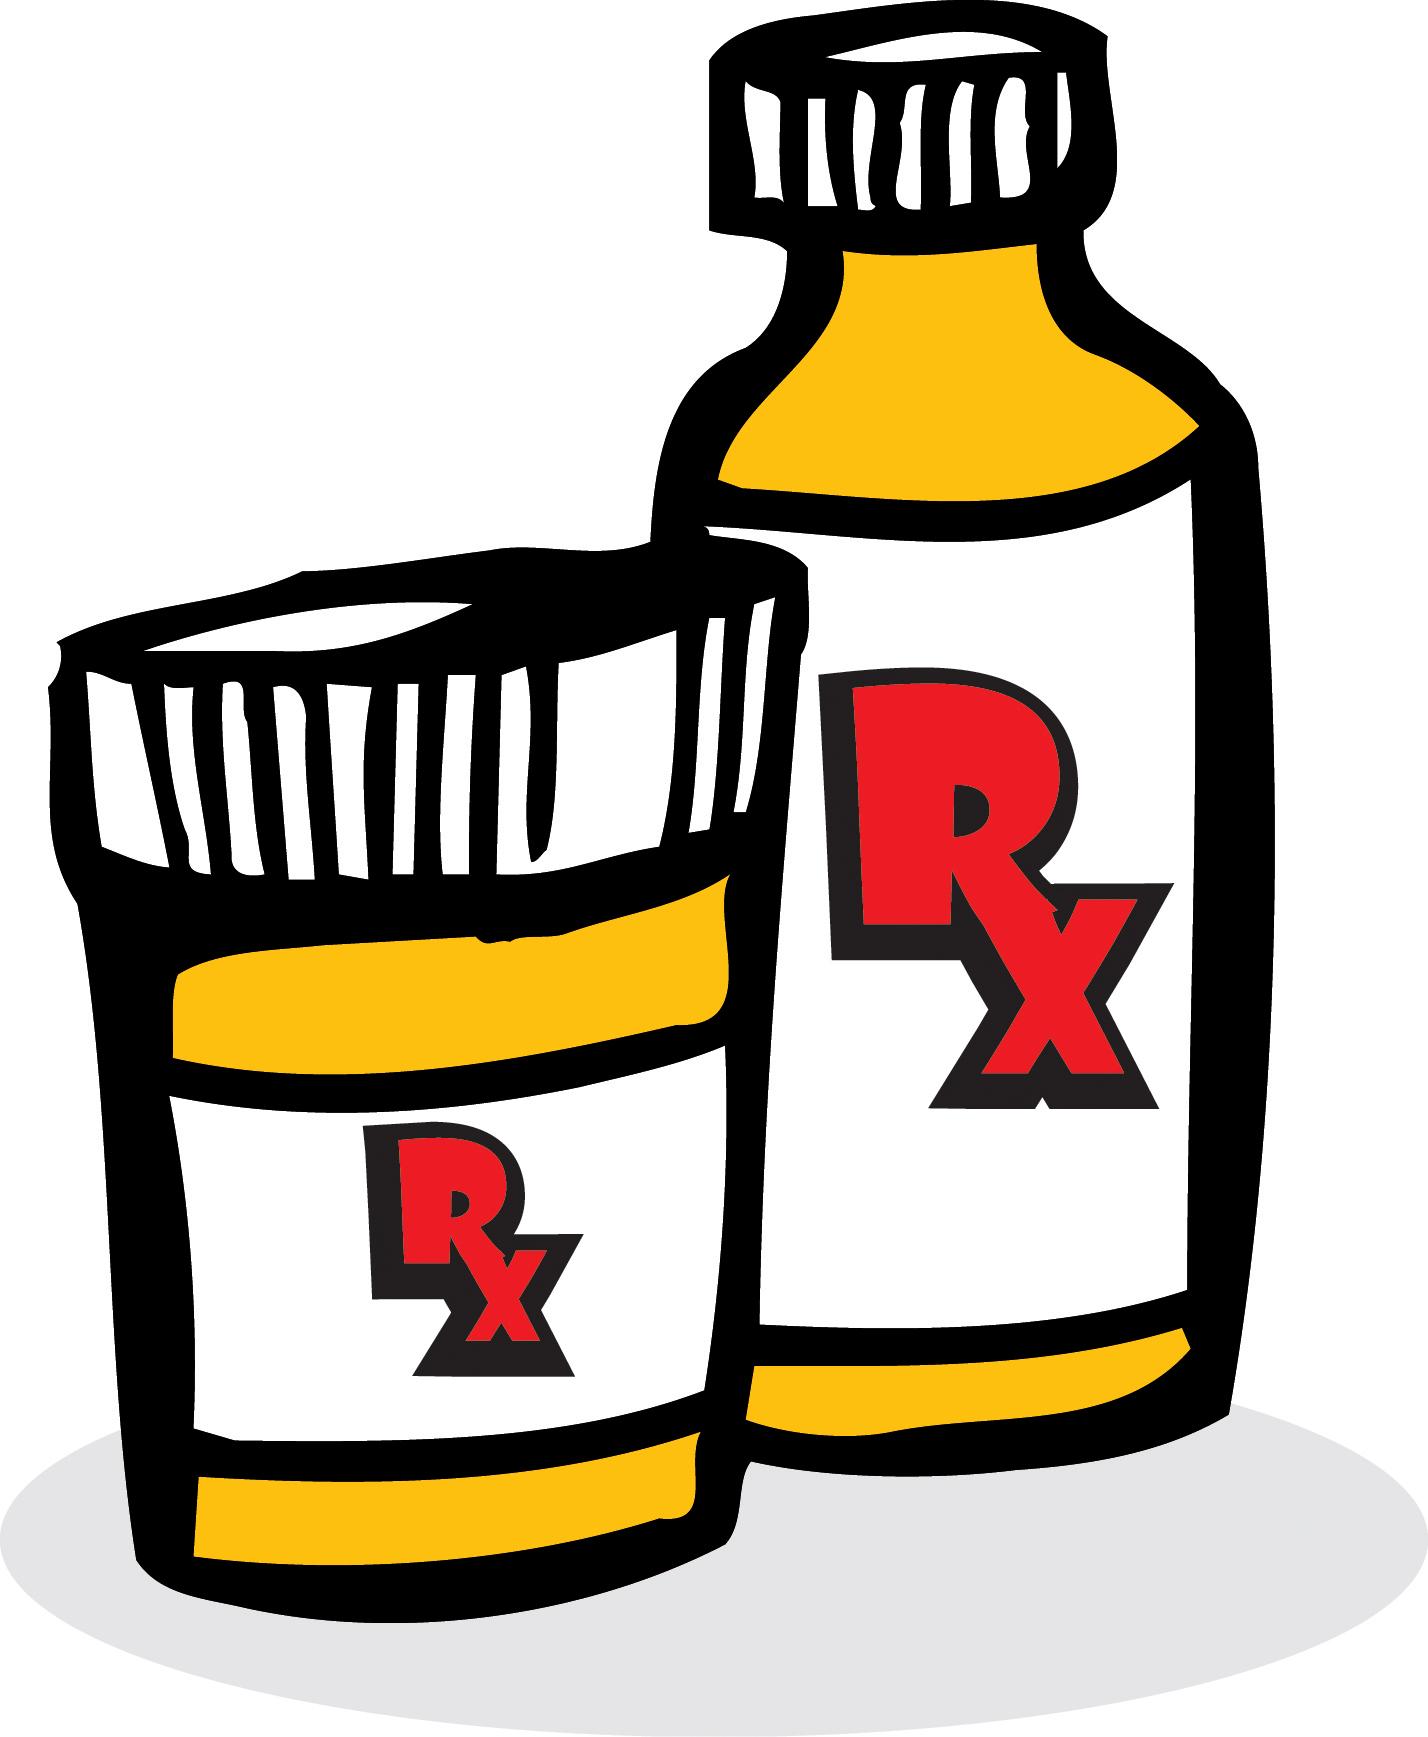 Clipart pill bottles jpg royalty free Free Pill Bottle Cliparts, Download Free Clip Art, Free Clip Art on ... jpg royalty free